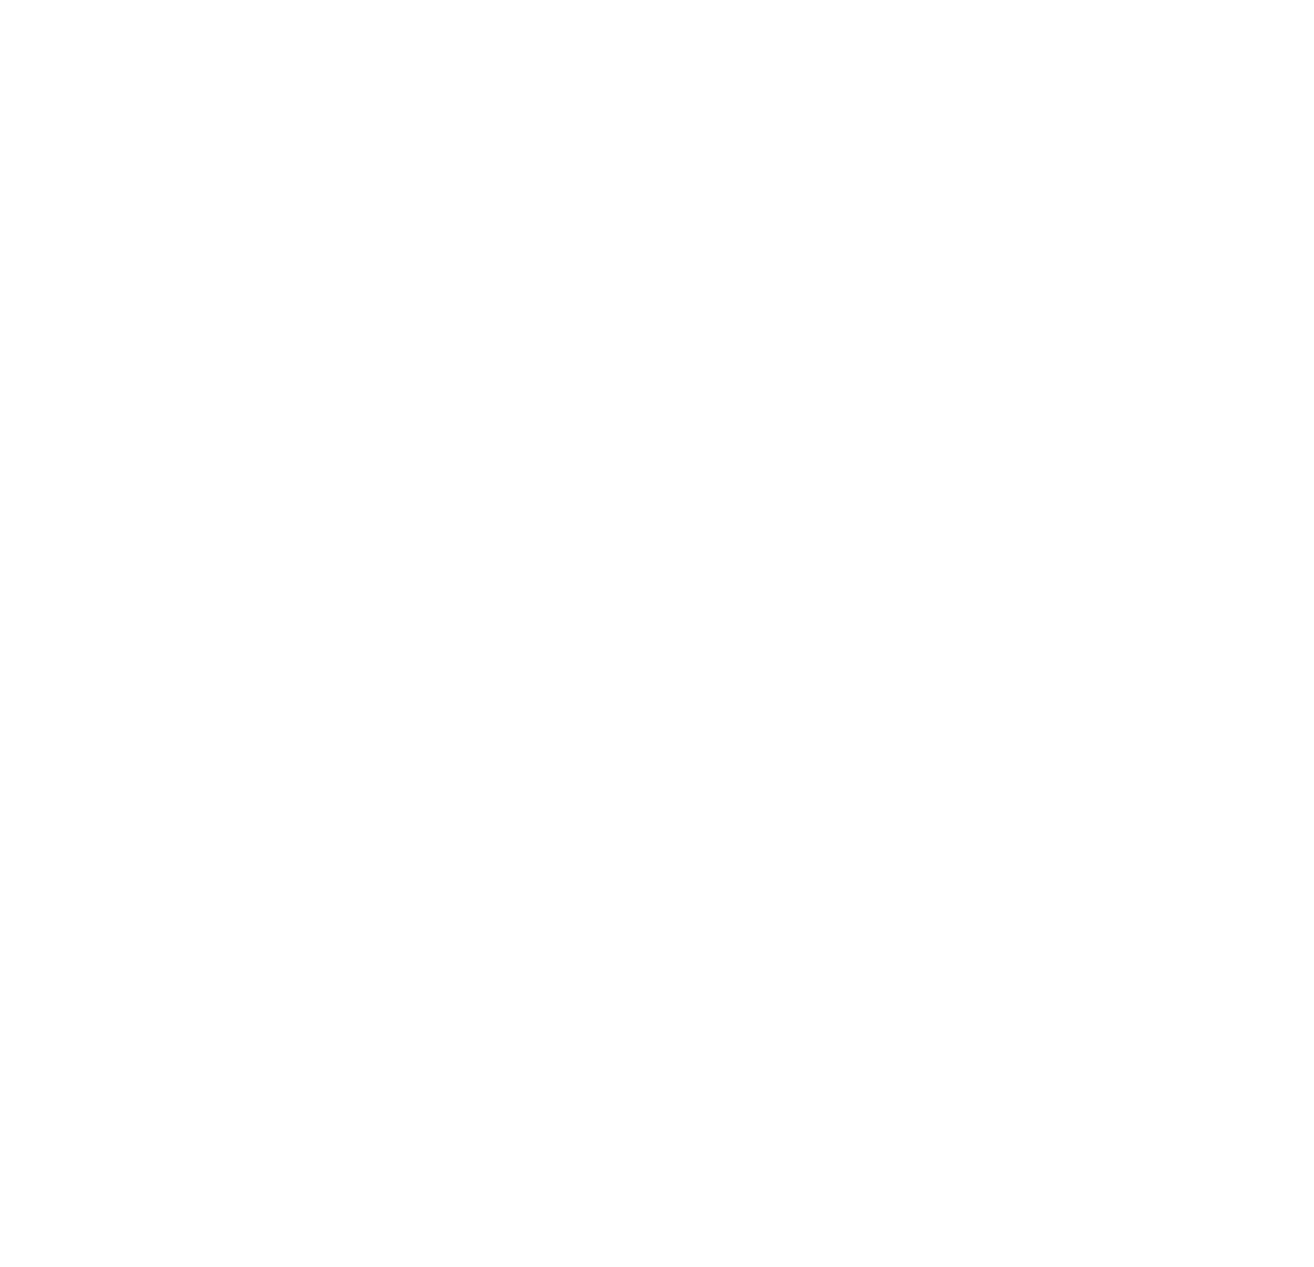 #digitalveritas - Soziale Medien, Corporate Design, Webdesign, SEO, SEA, Content, Workshop, Augsburg, München, Stuttgart